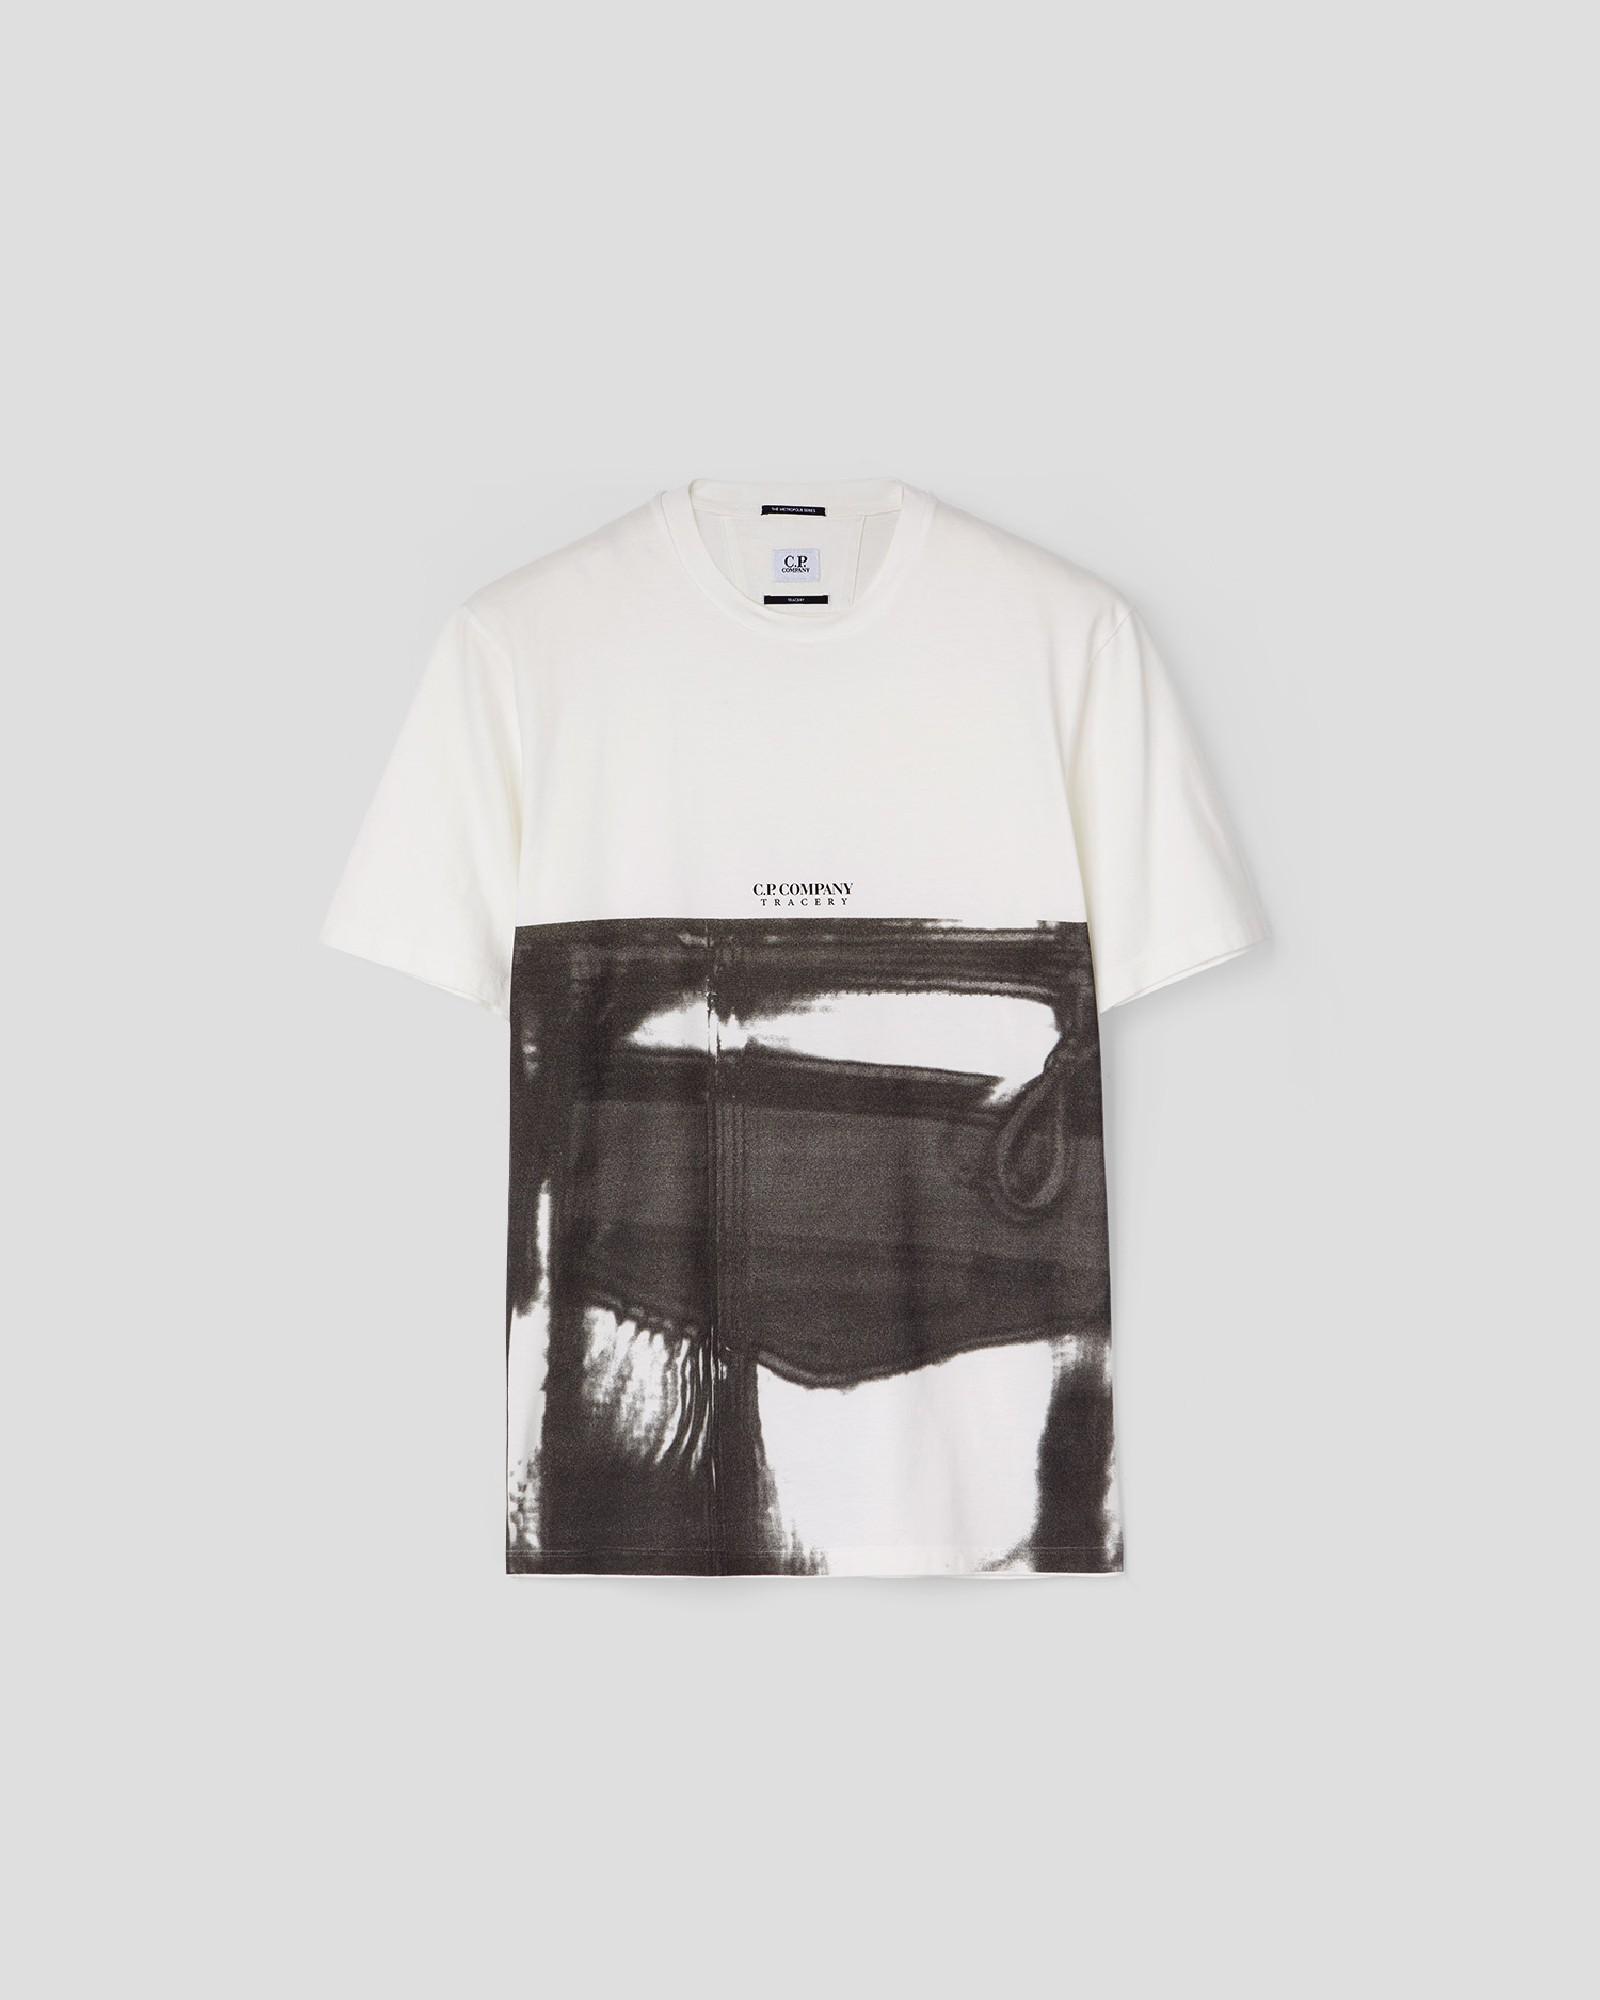 T-shirt uomo C.P. COMPANY | T-shirt | MTS202A00 5621P999